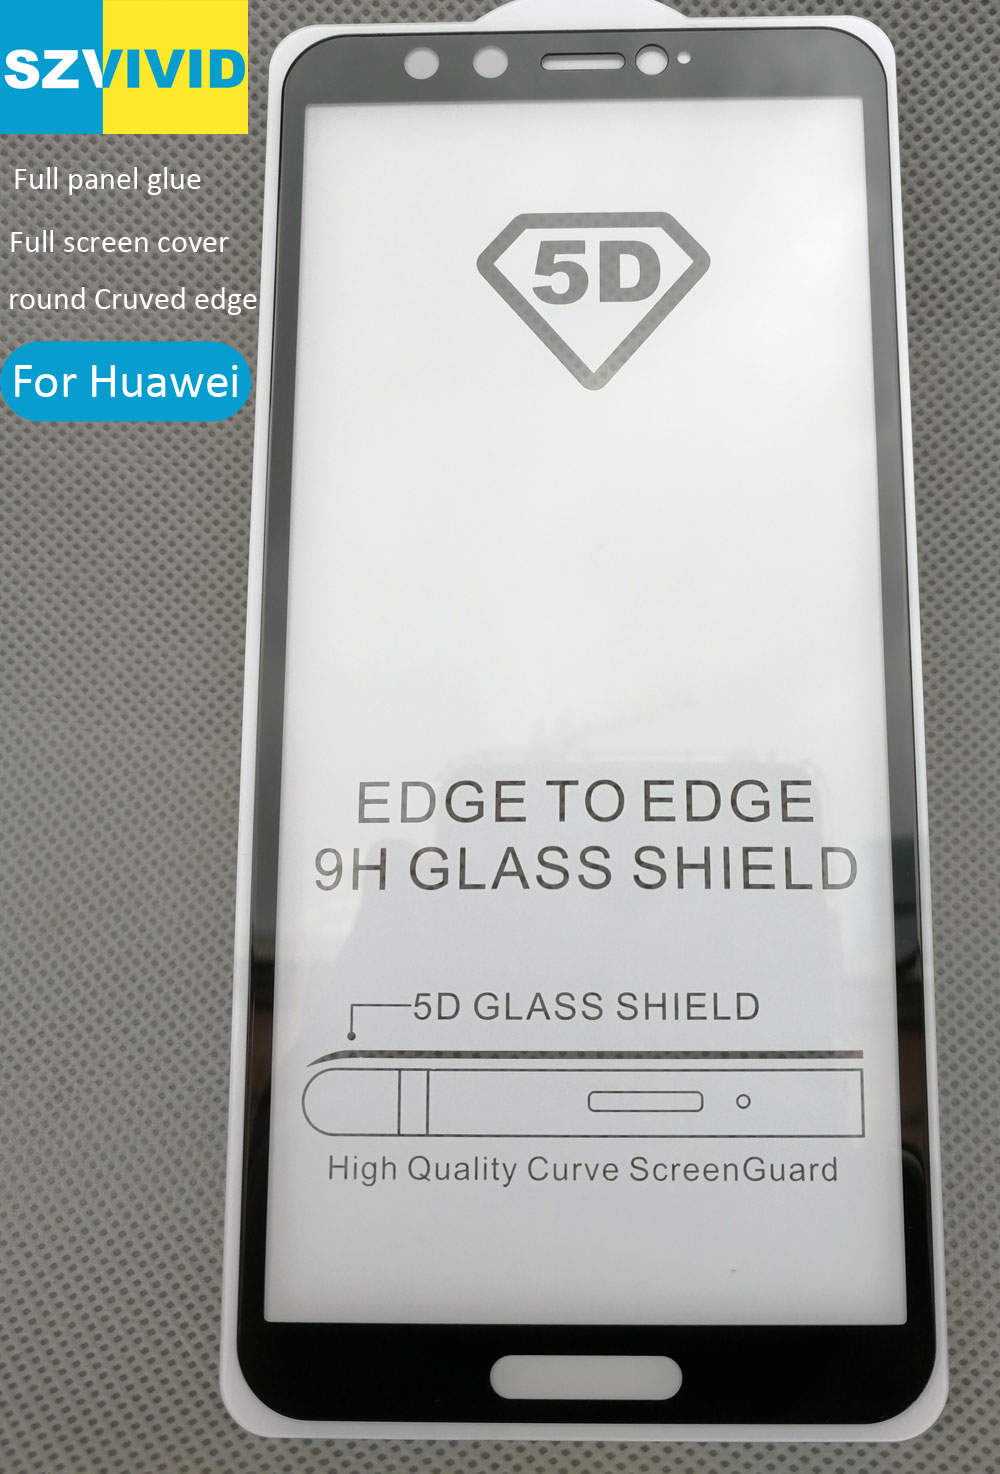 Full Screen Panel Kleber Abdeckung Gehärtetem Glas Für Huawei P Smart Honor 9 Lite 7C Pro 7A Pro 2.5D Cruved oleophobe Hohes qualität